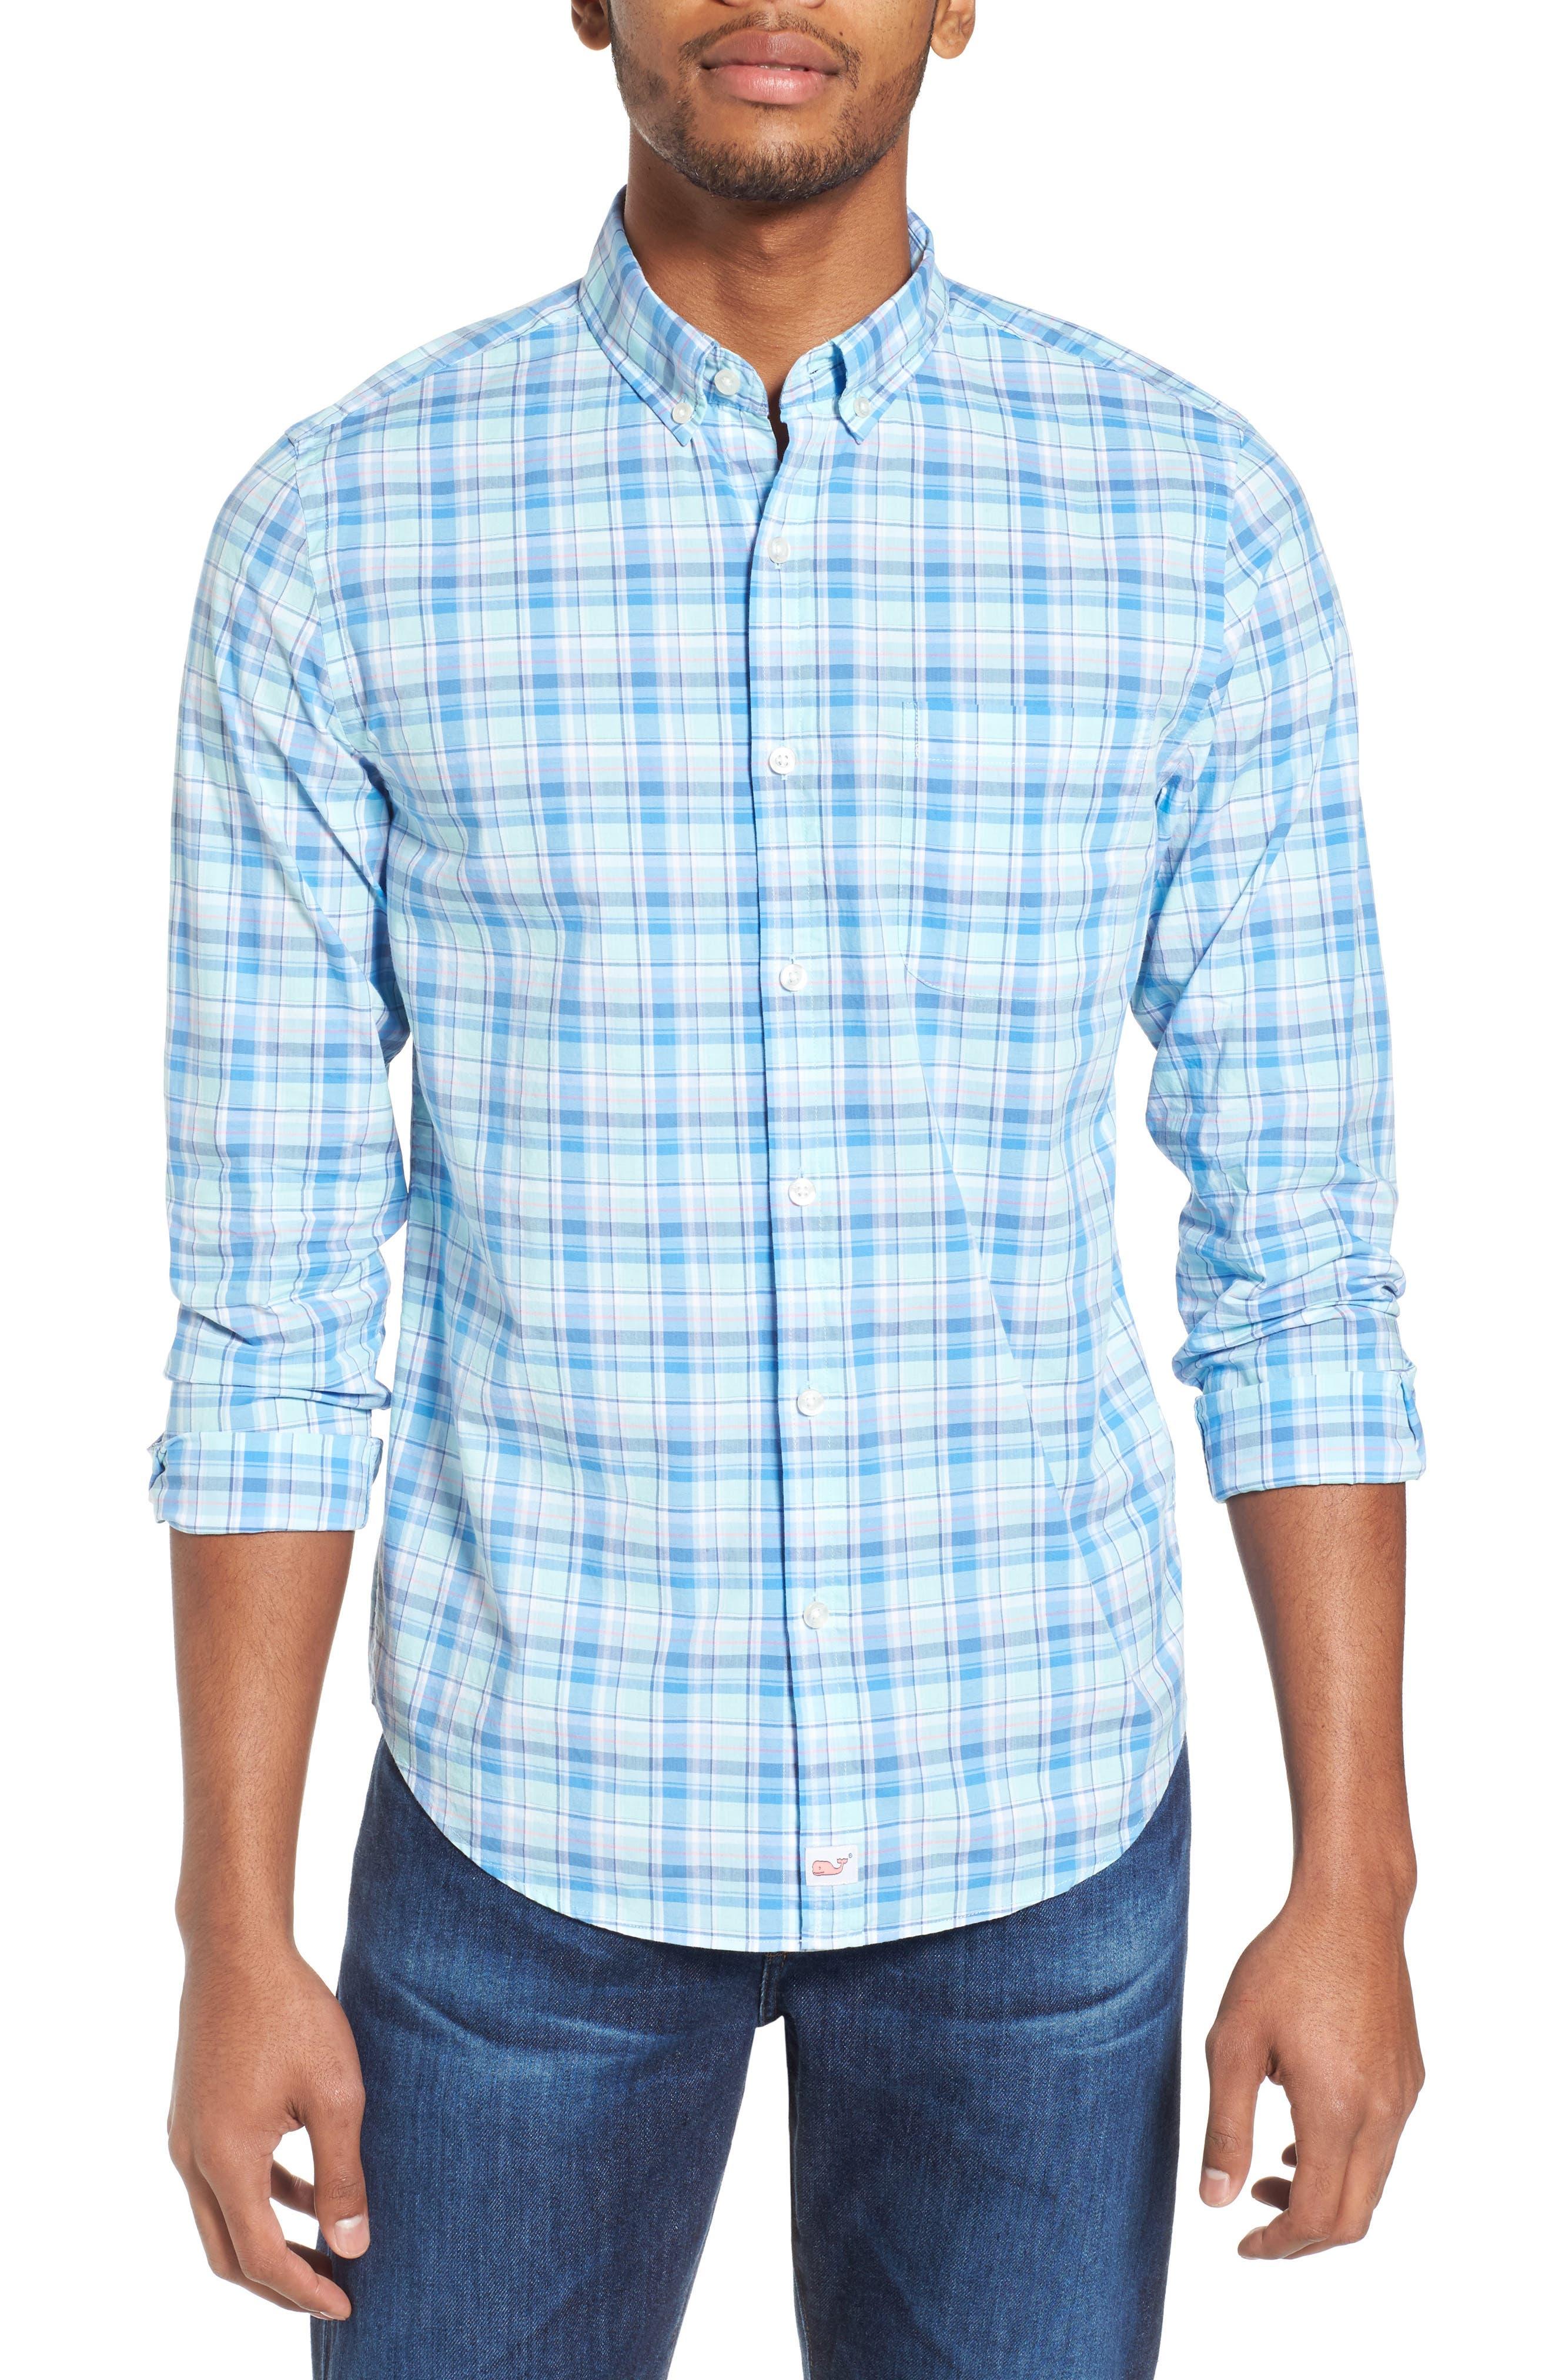 Murray Pine Island Slim Fit Plaid Sport Shirt,                             Main thumbnail 1, color,                             422